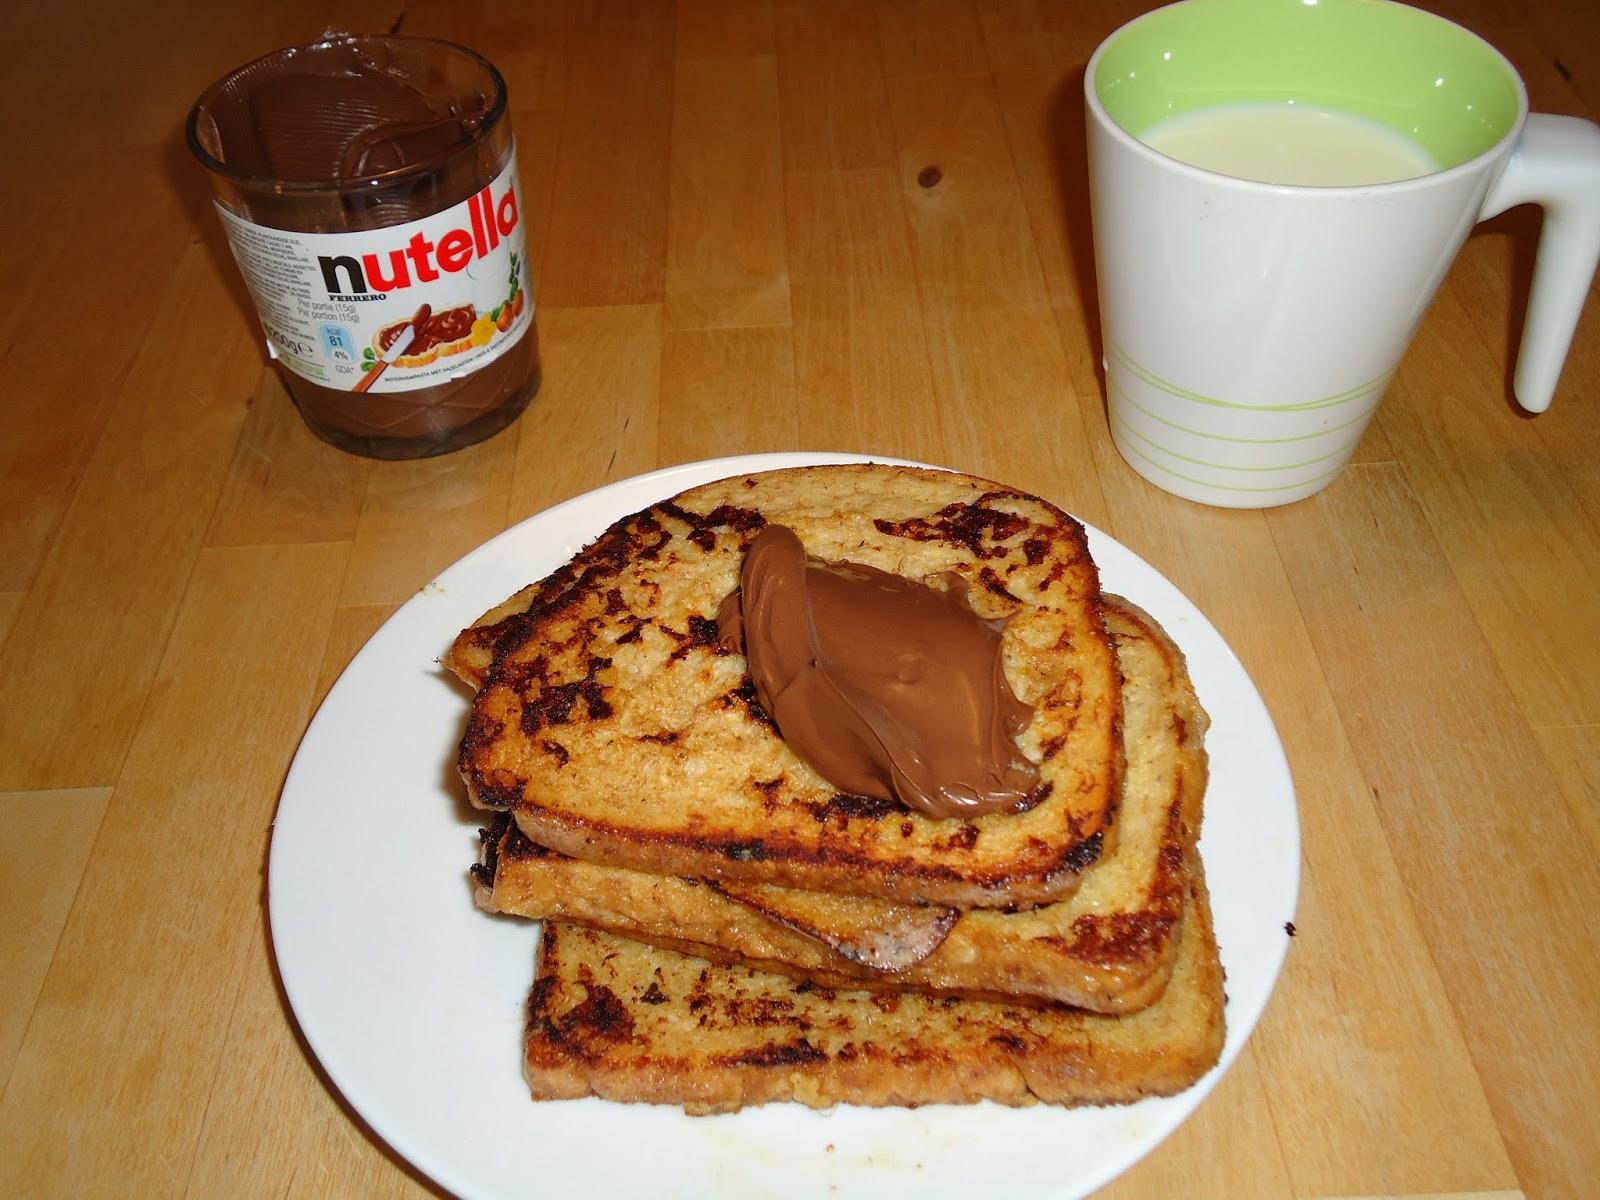 chroazfood pain perdu au banane et nutella. Black Bedroom Furniture Sets. Home Design Ideas